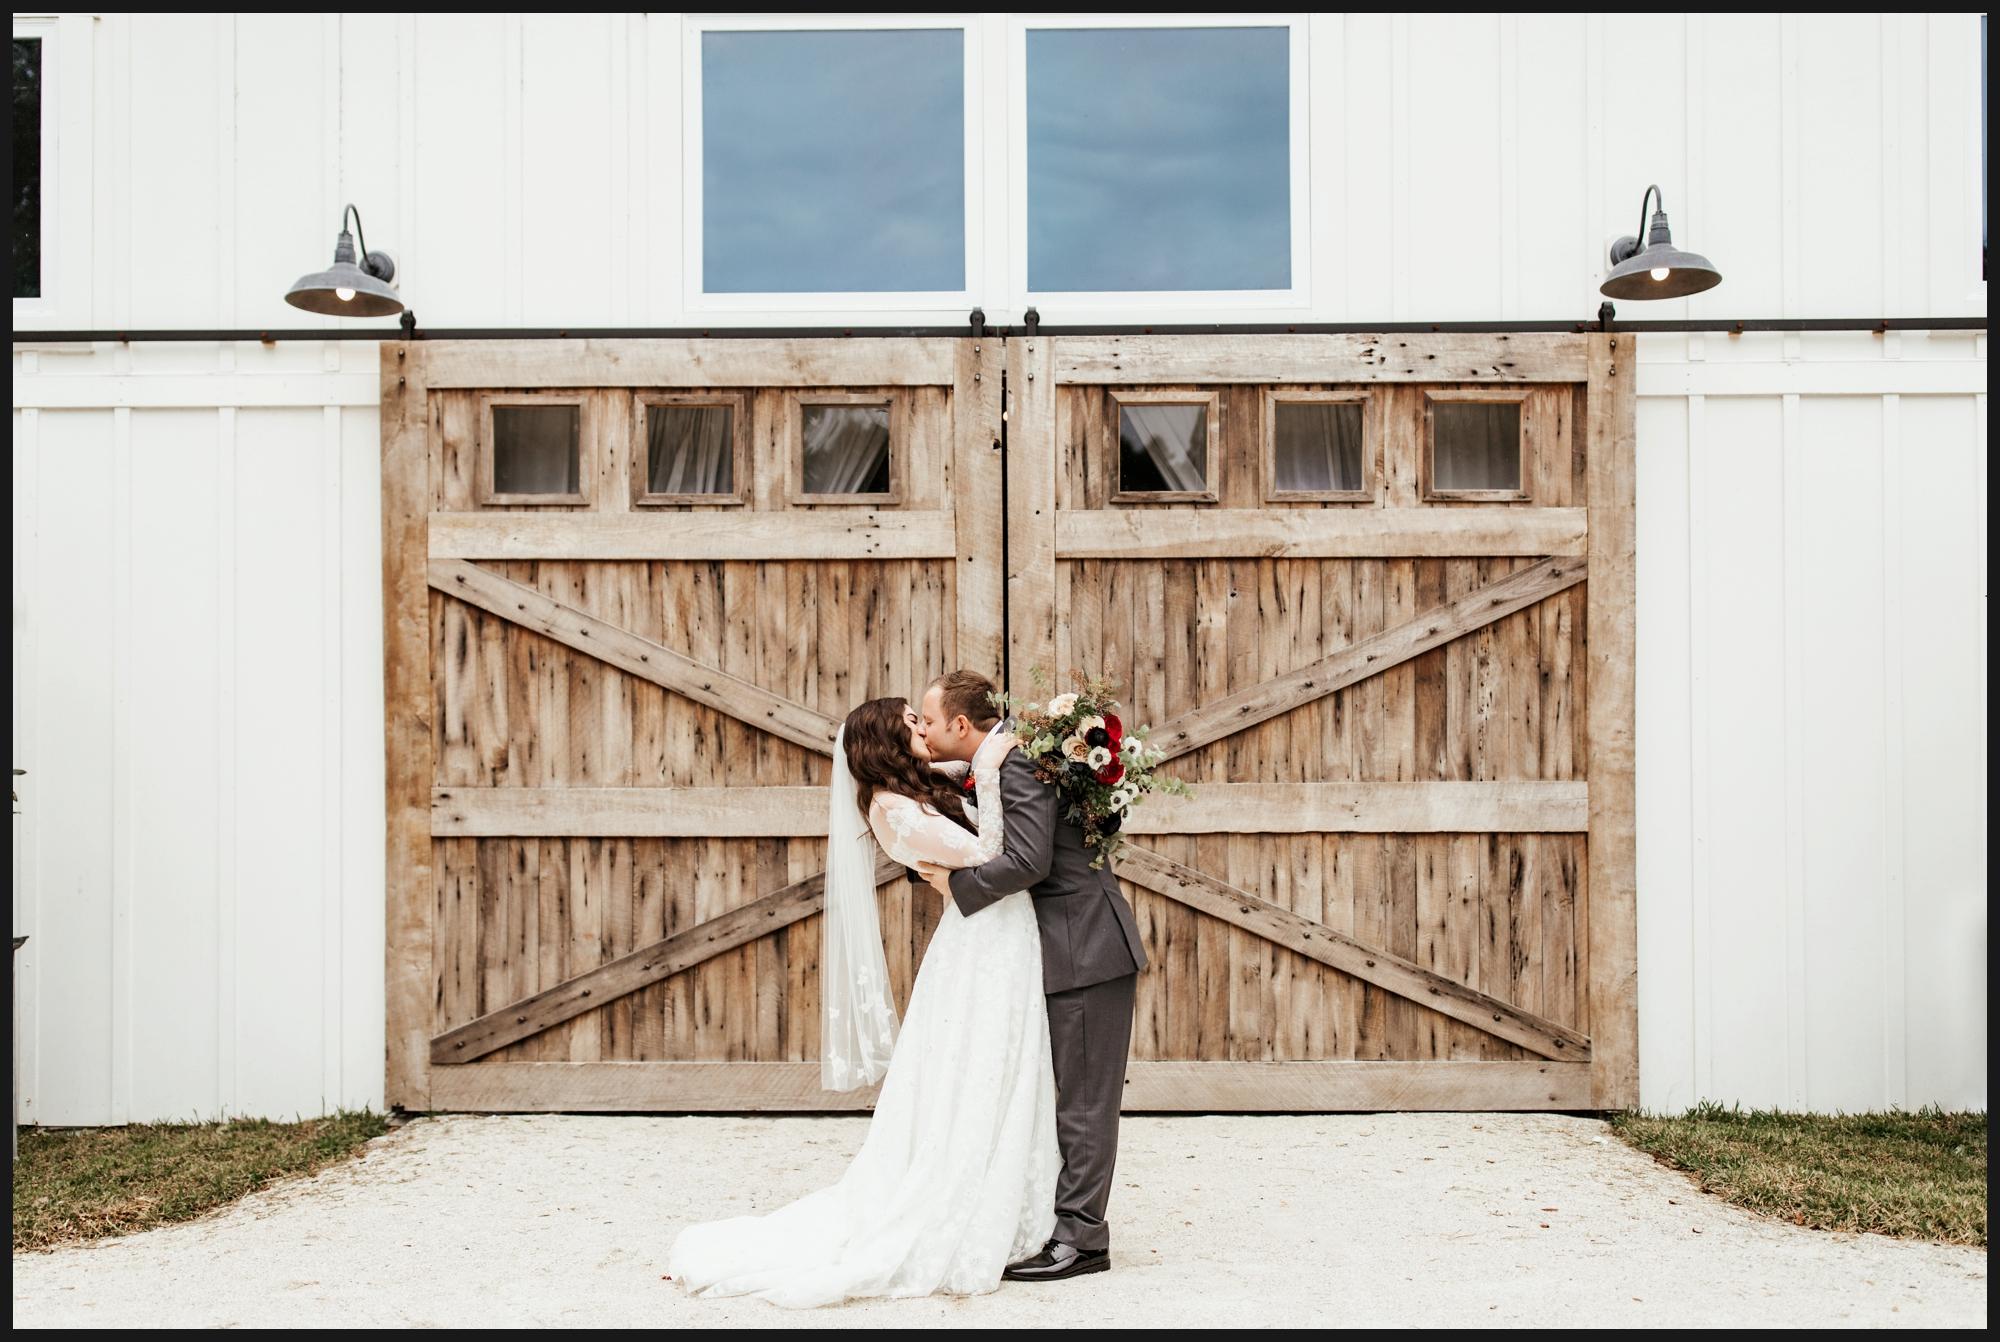 Orlando-Wedding-Photographer-destination-wedding-photographer-florida-wedding-photographer-hawaii-wedding-photographer_0508.jpg